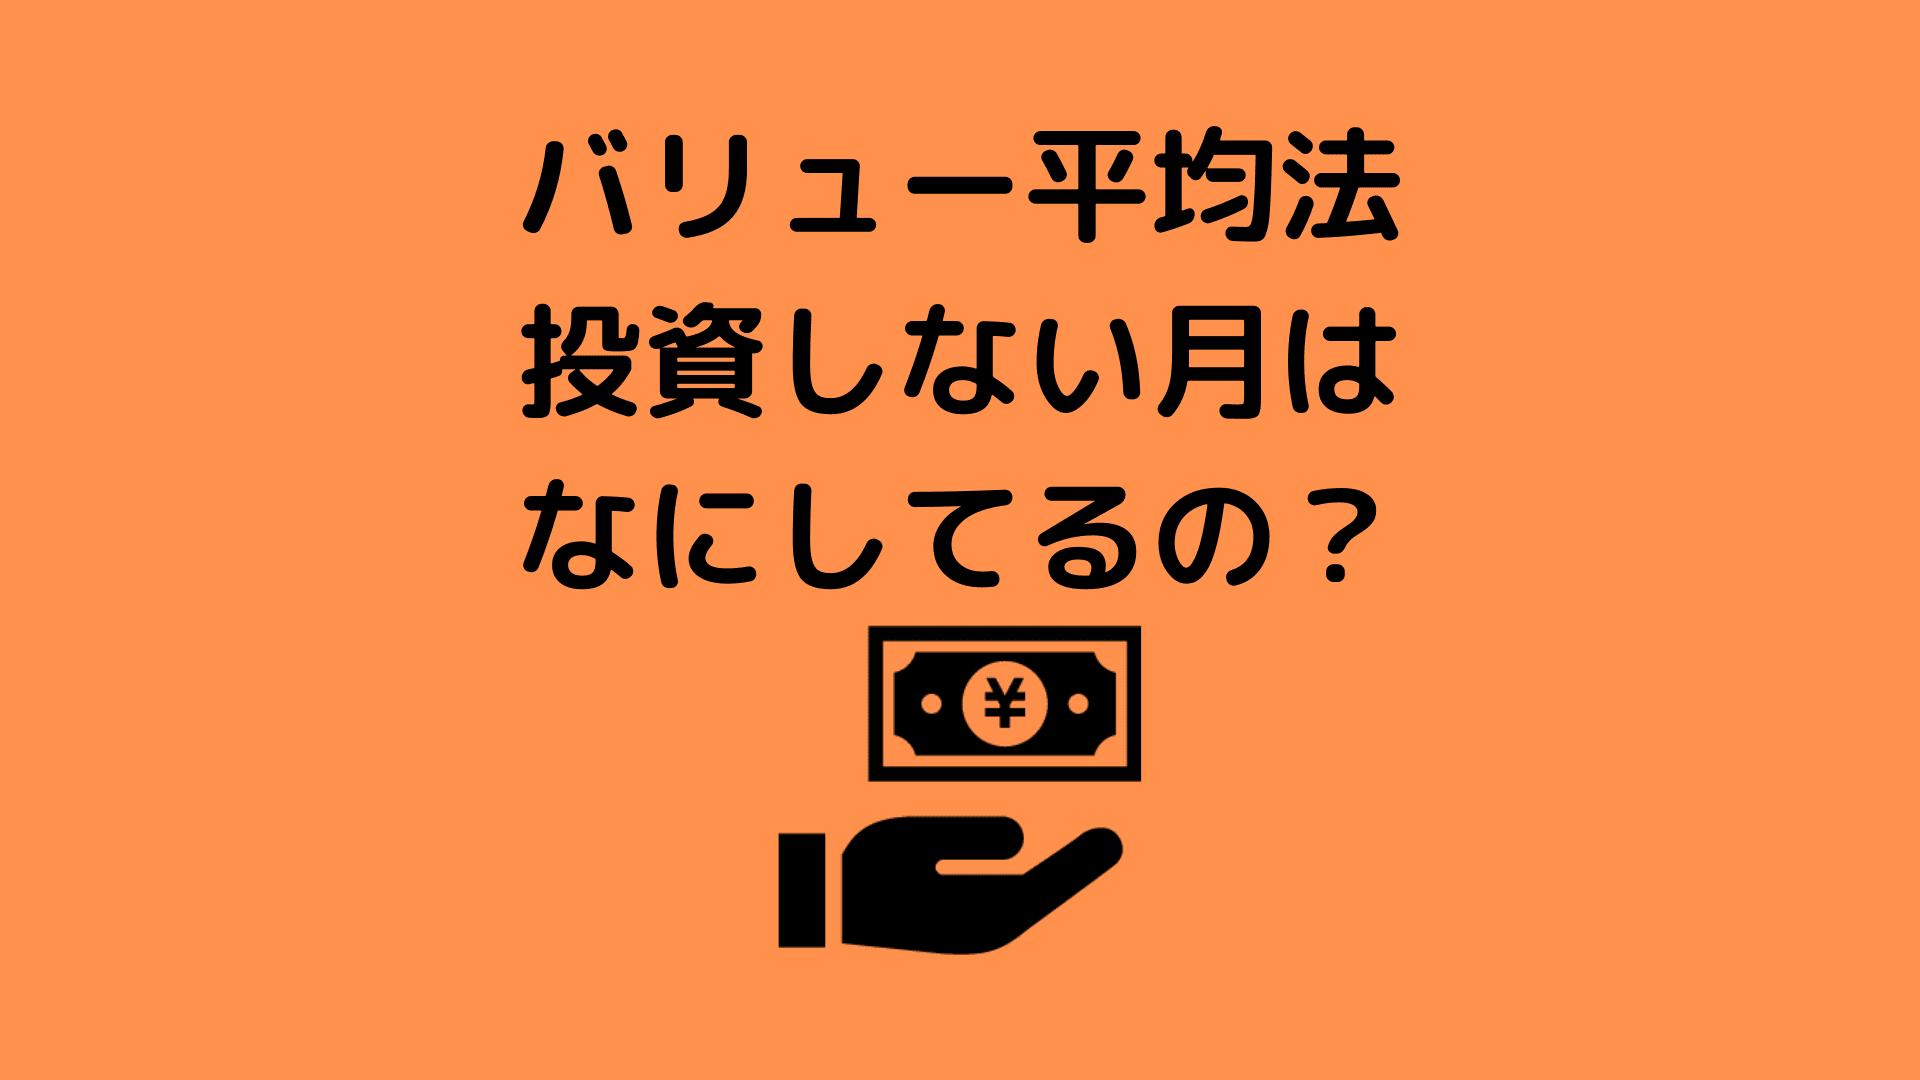 Value avarage shinaitoki